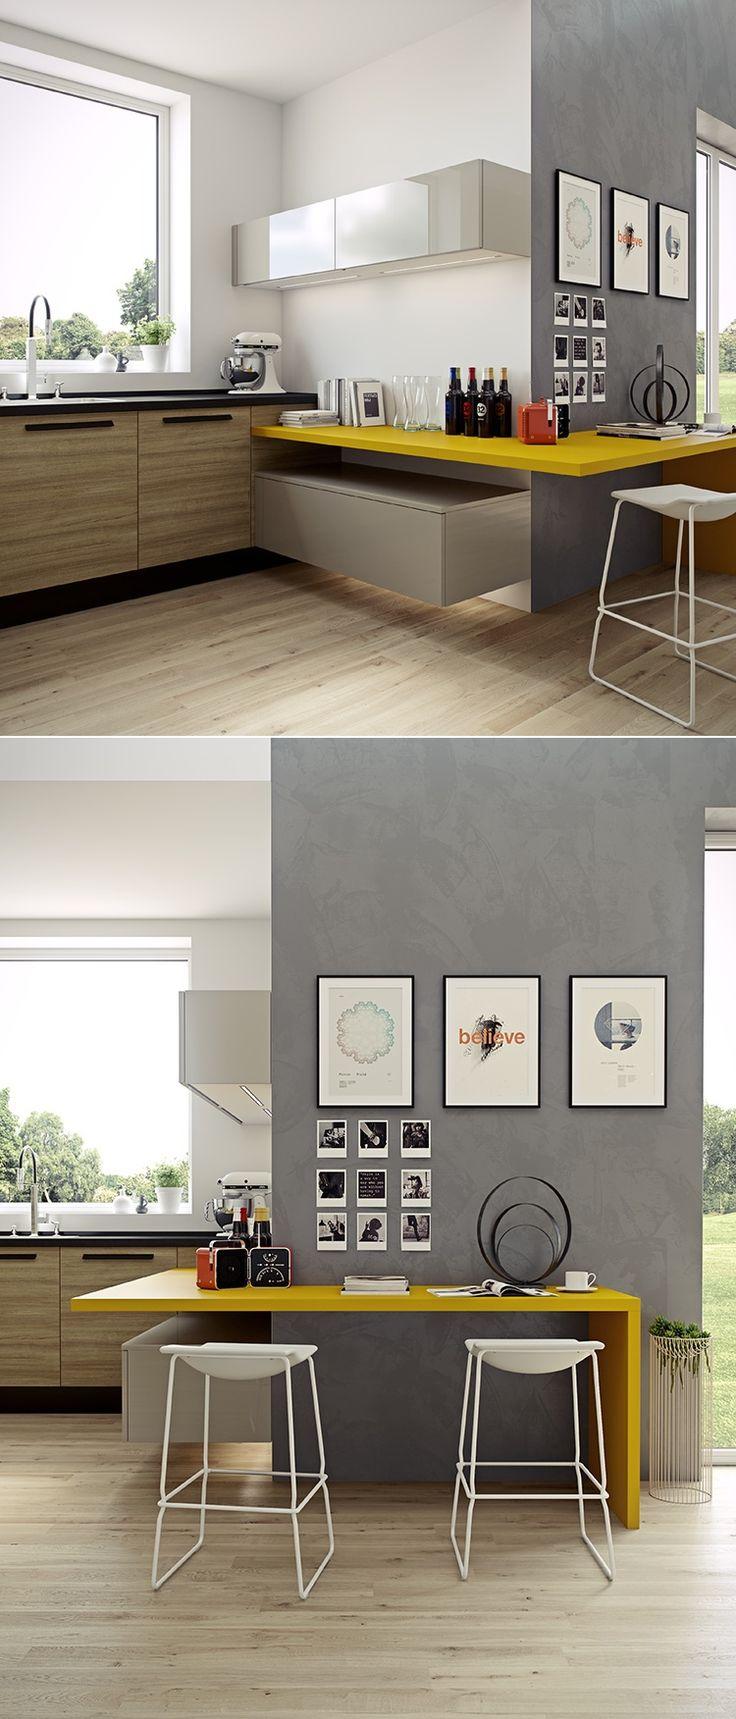 best 25+ masculine kitchen ideas on pinterest | industrial house